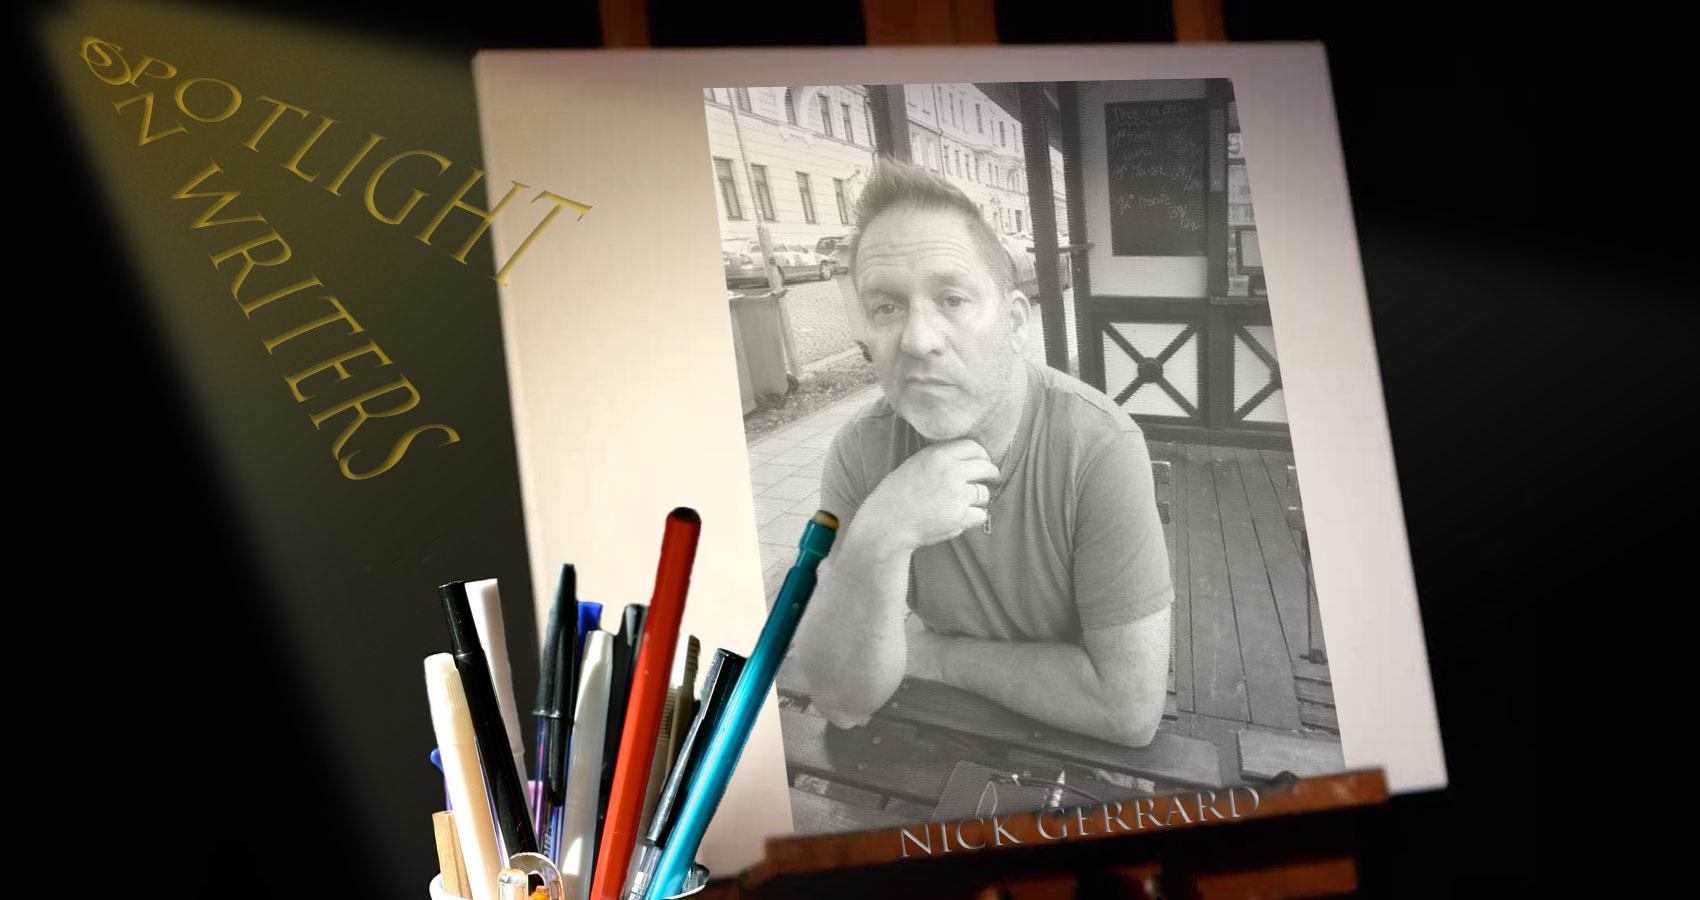 Spotlight On Writers - Nick Gerrard, interview at Spillwords.com